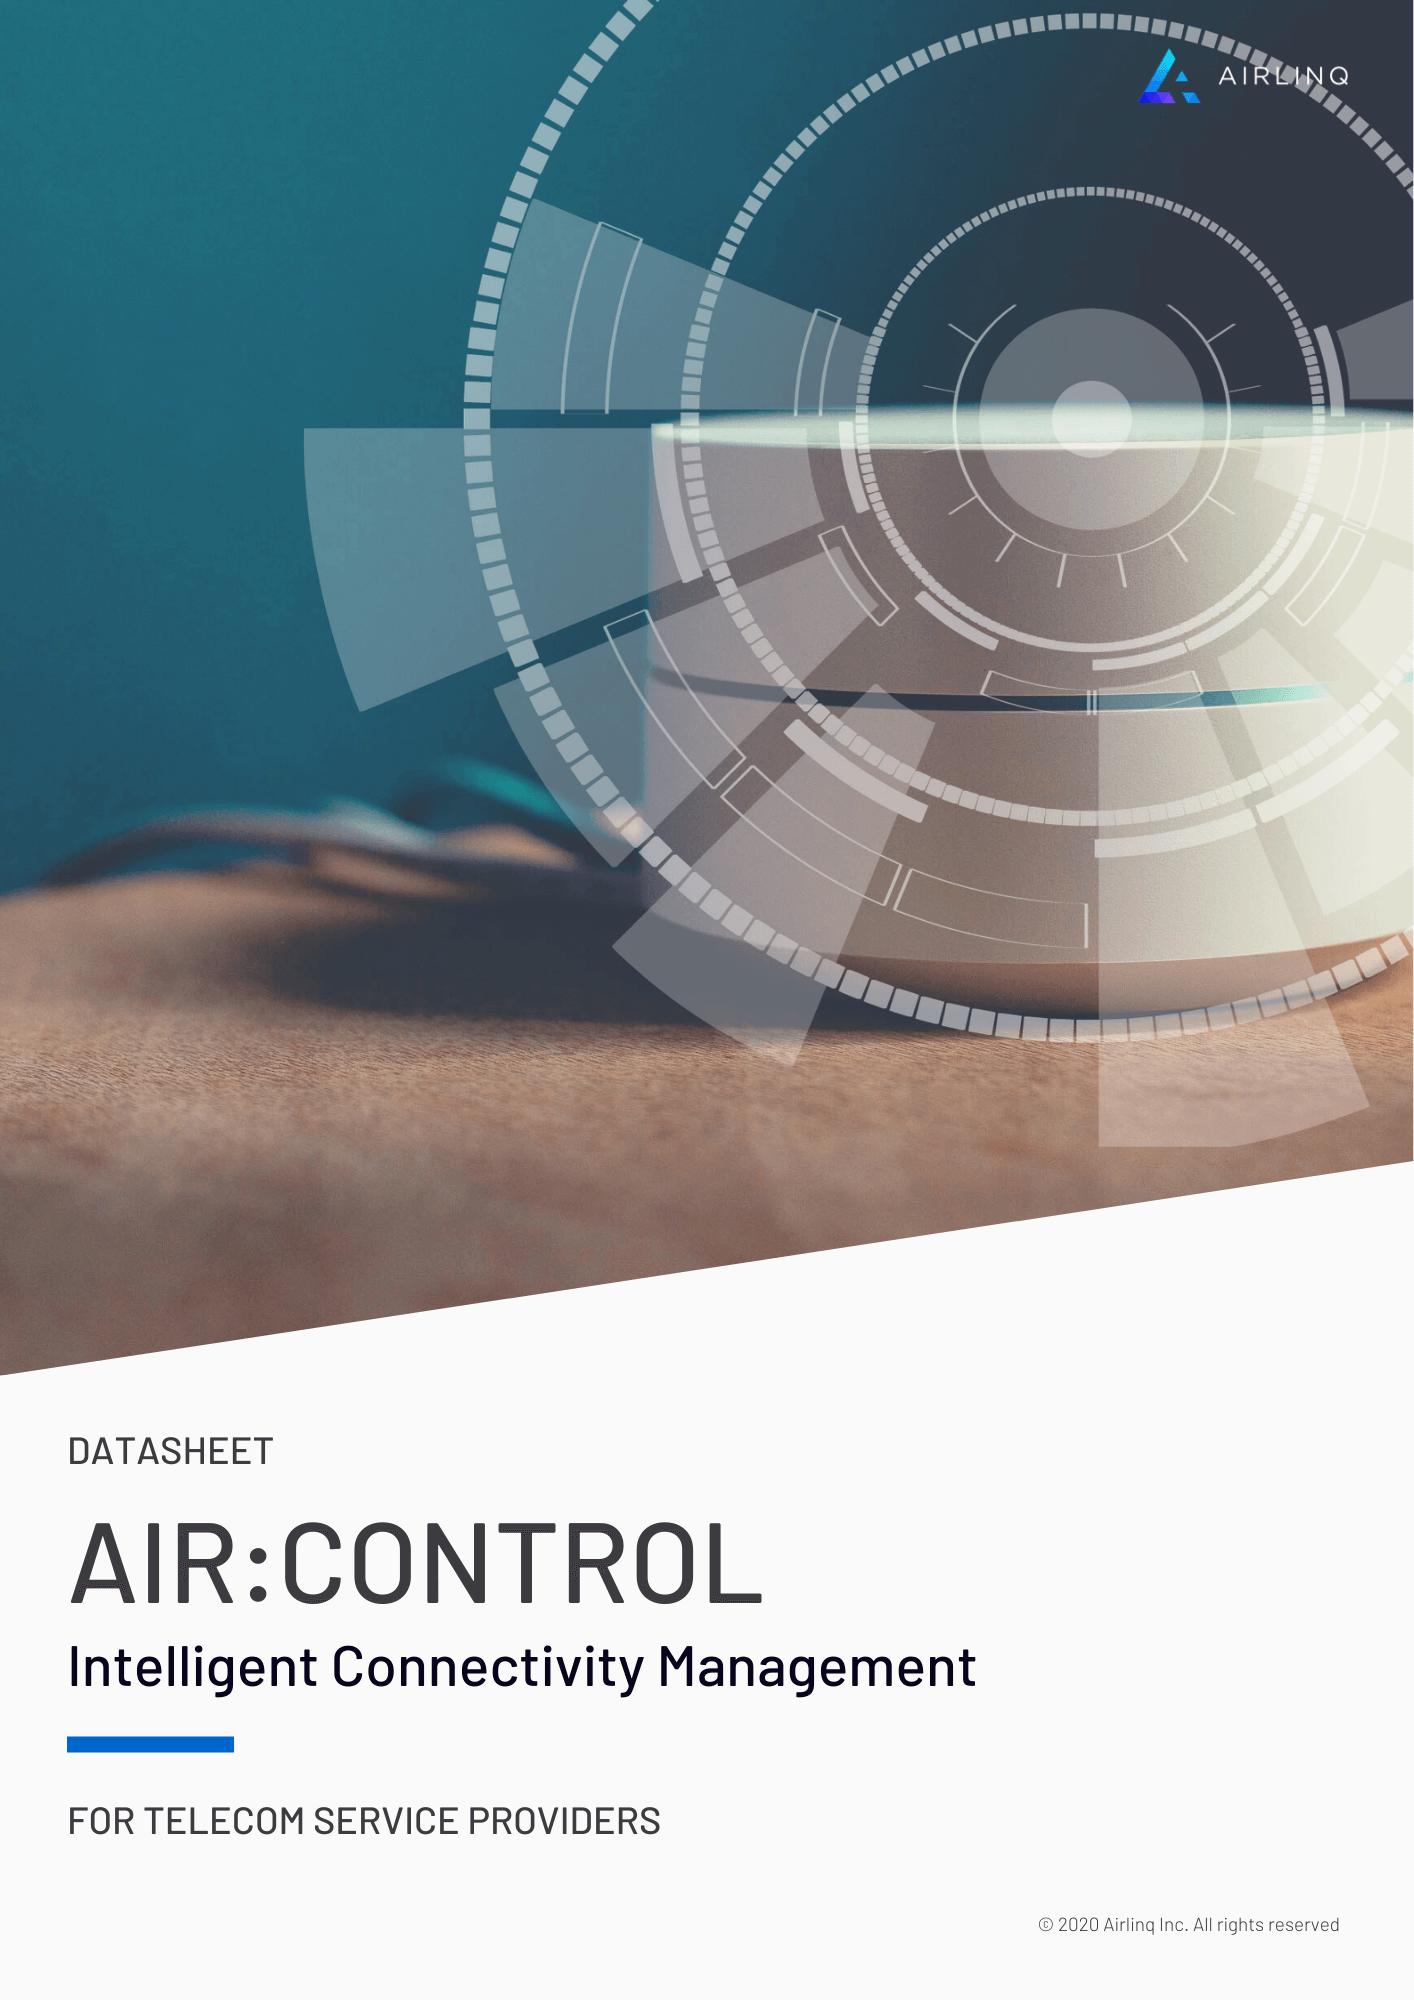 AIR:CONTROL Intelligent Connectivity Management